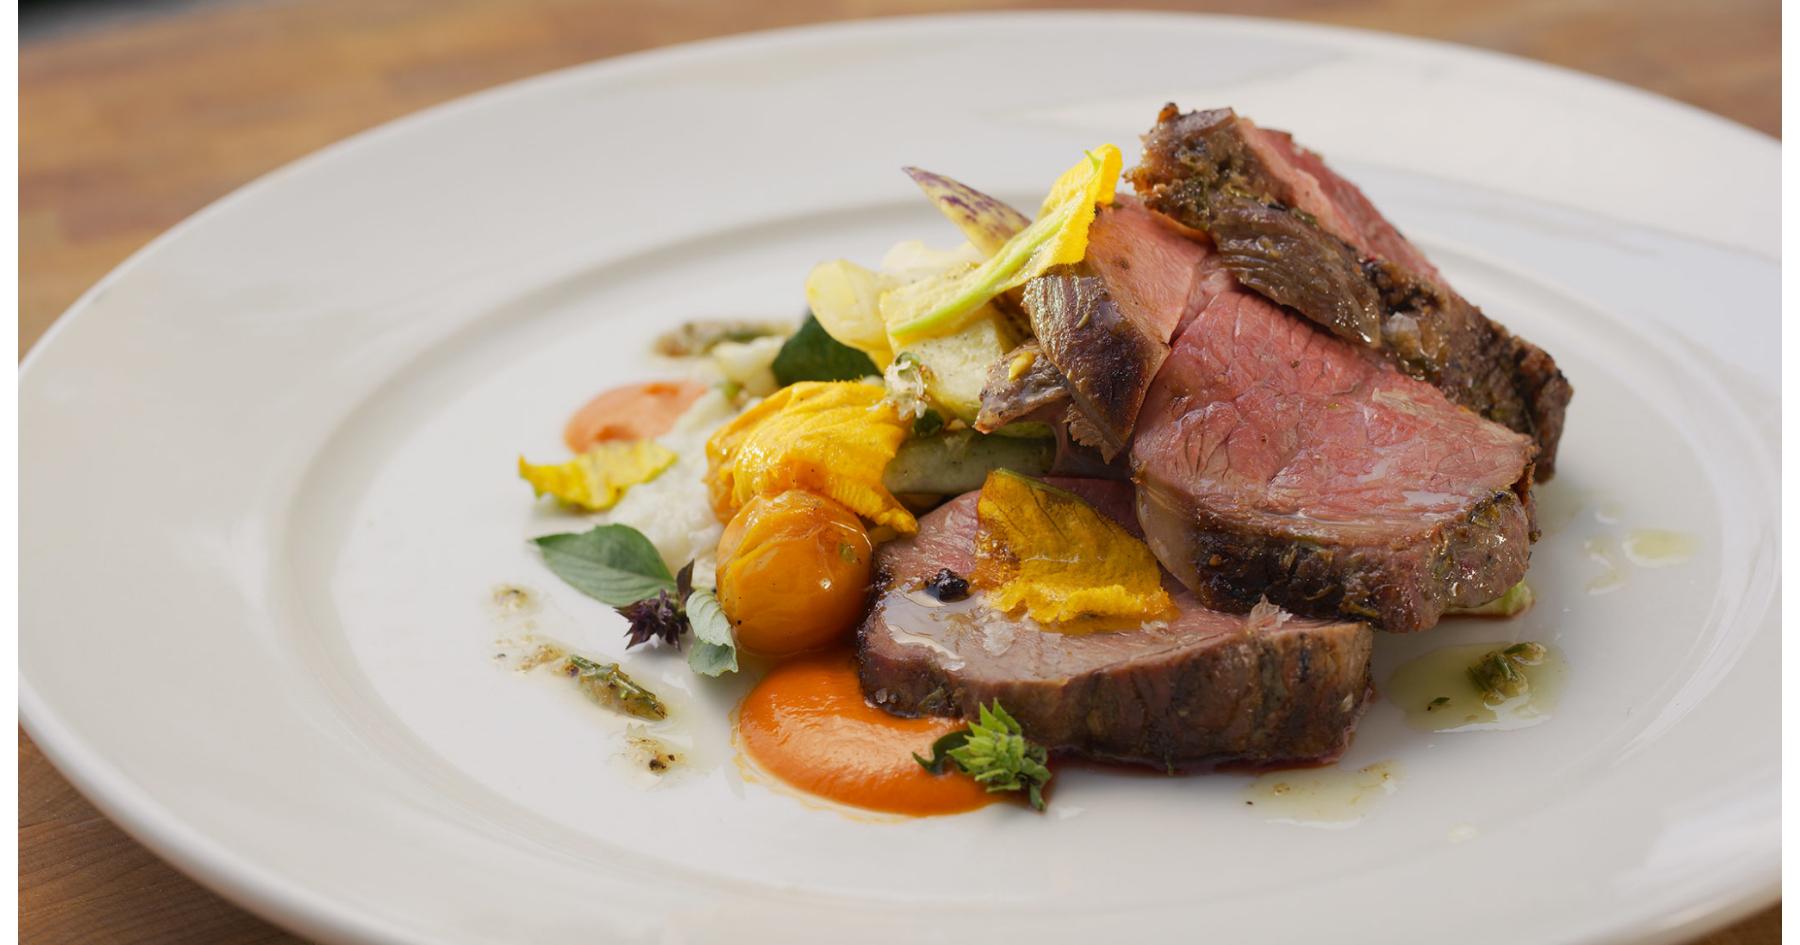 Grilled lamb and succotash